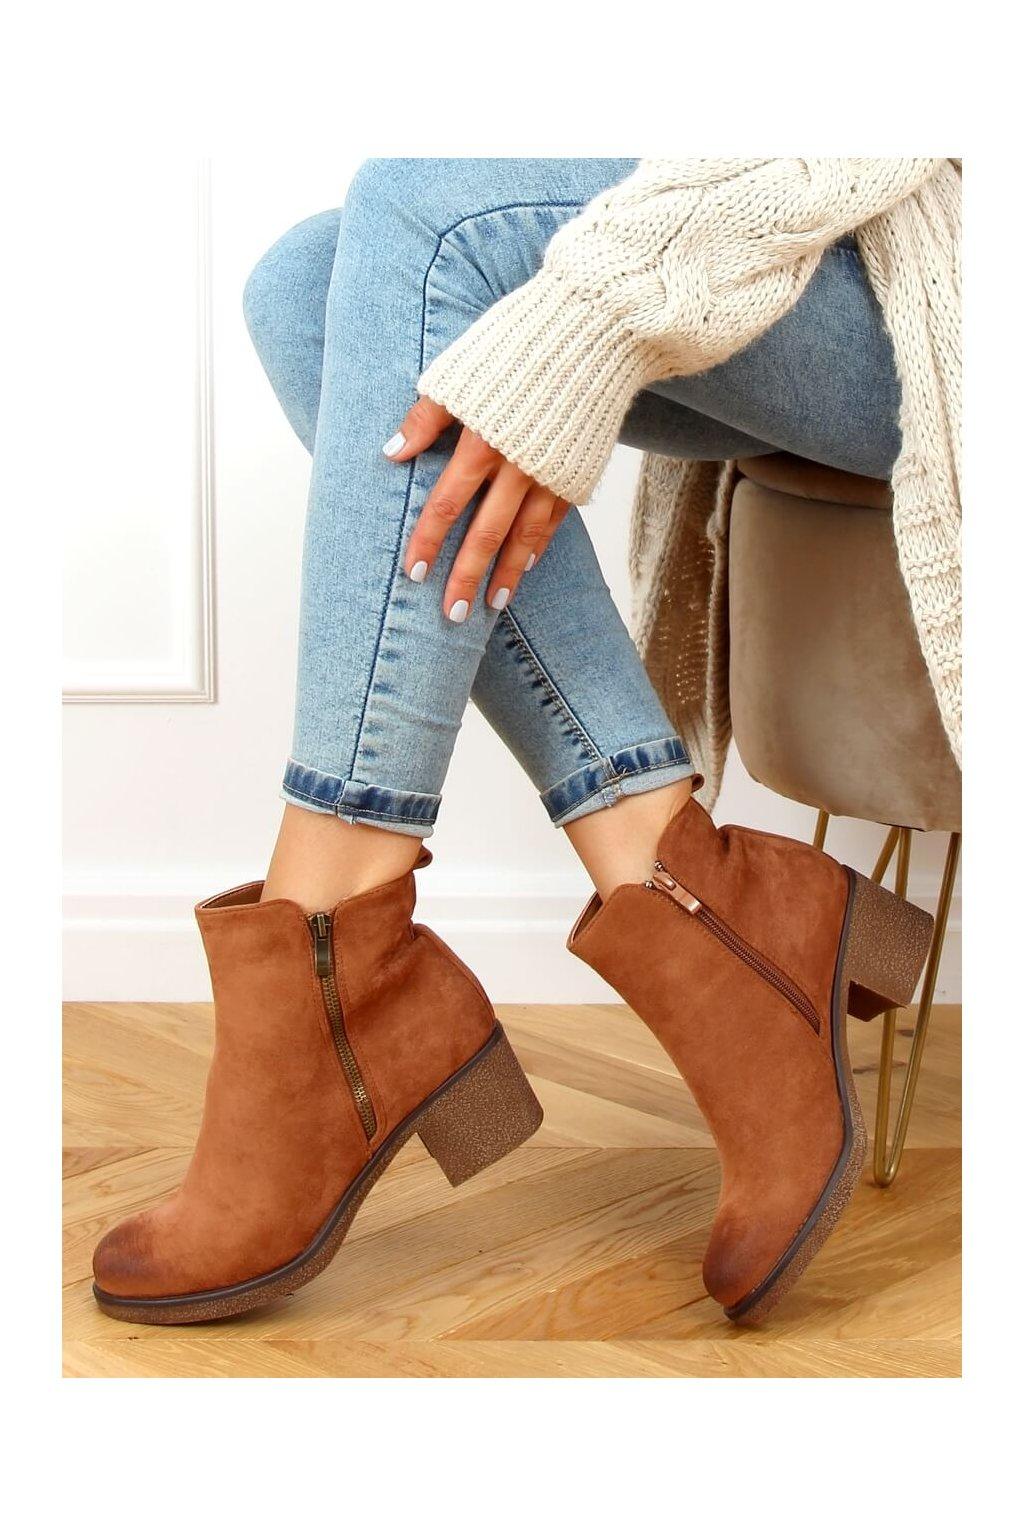 Dámske členkové topánky hnedé na širokom podpätku 8301